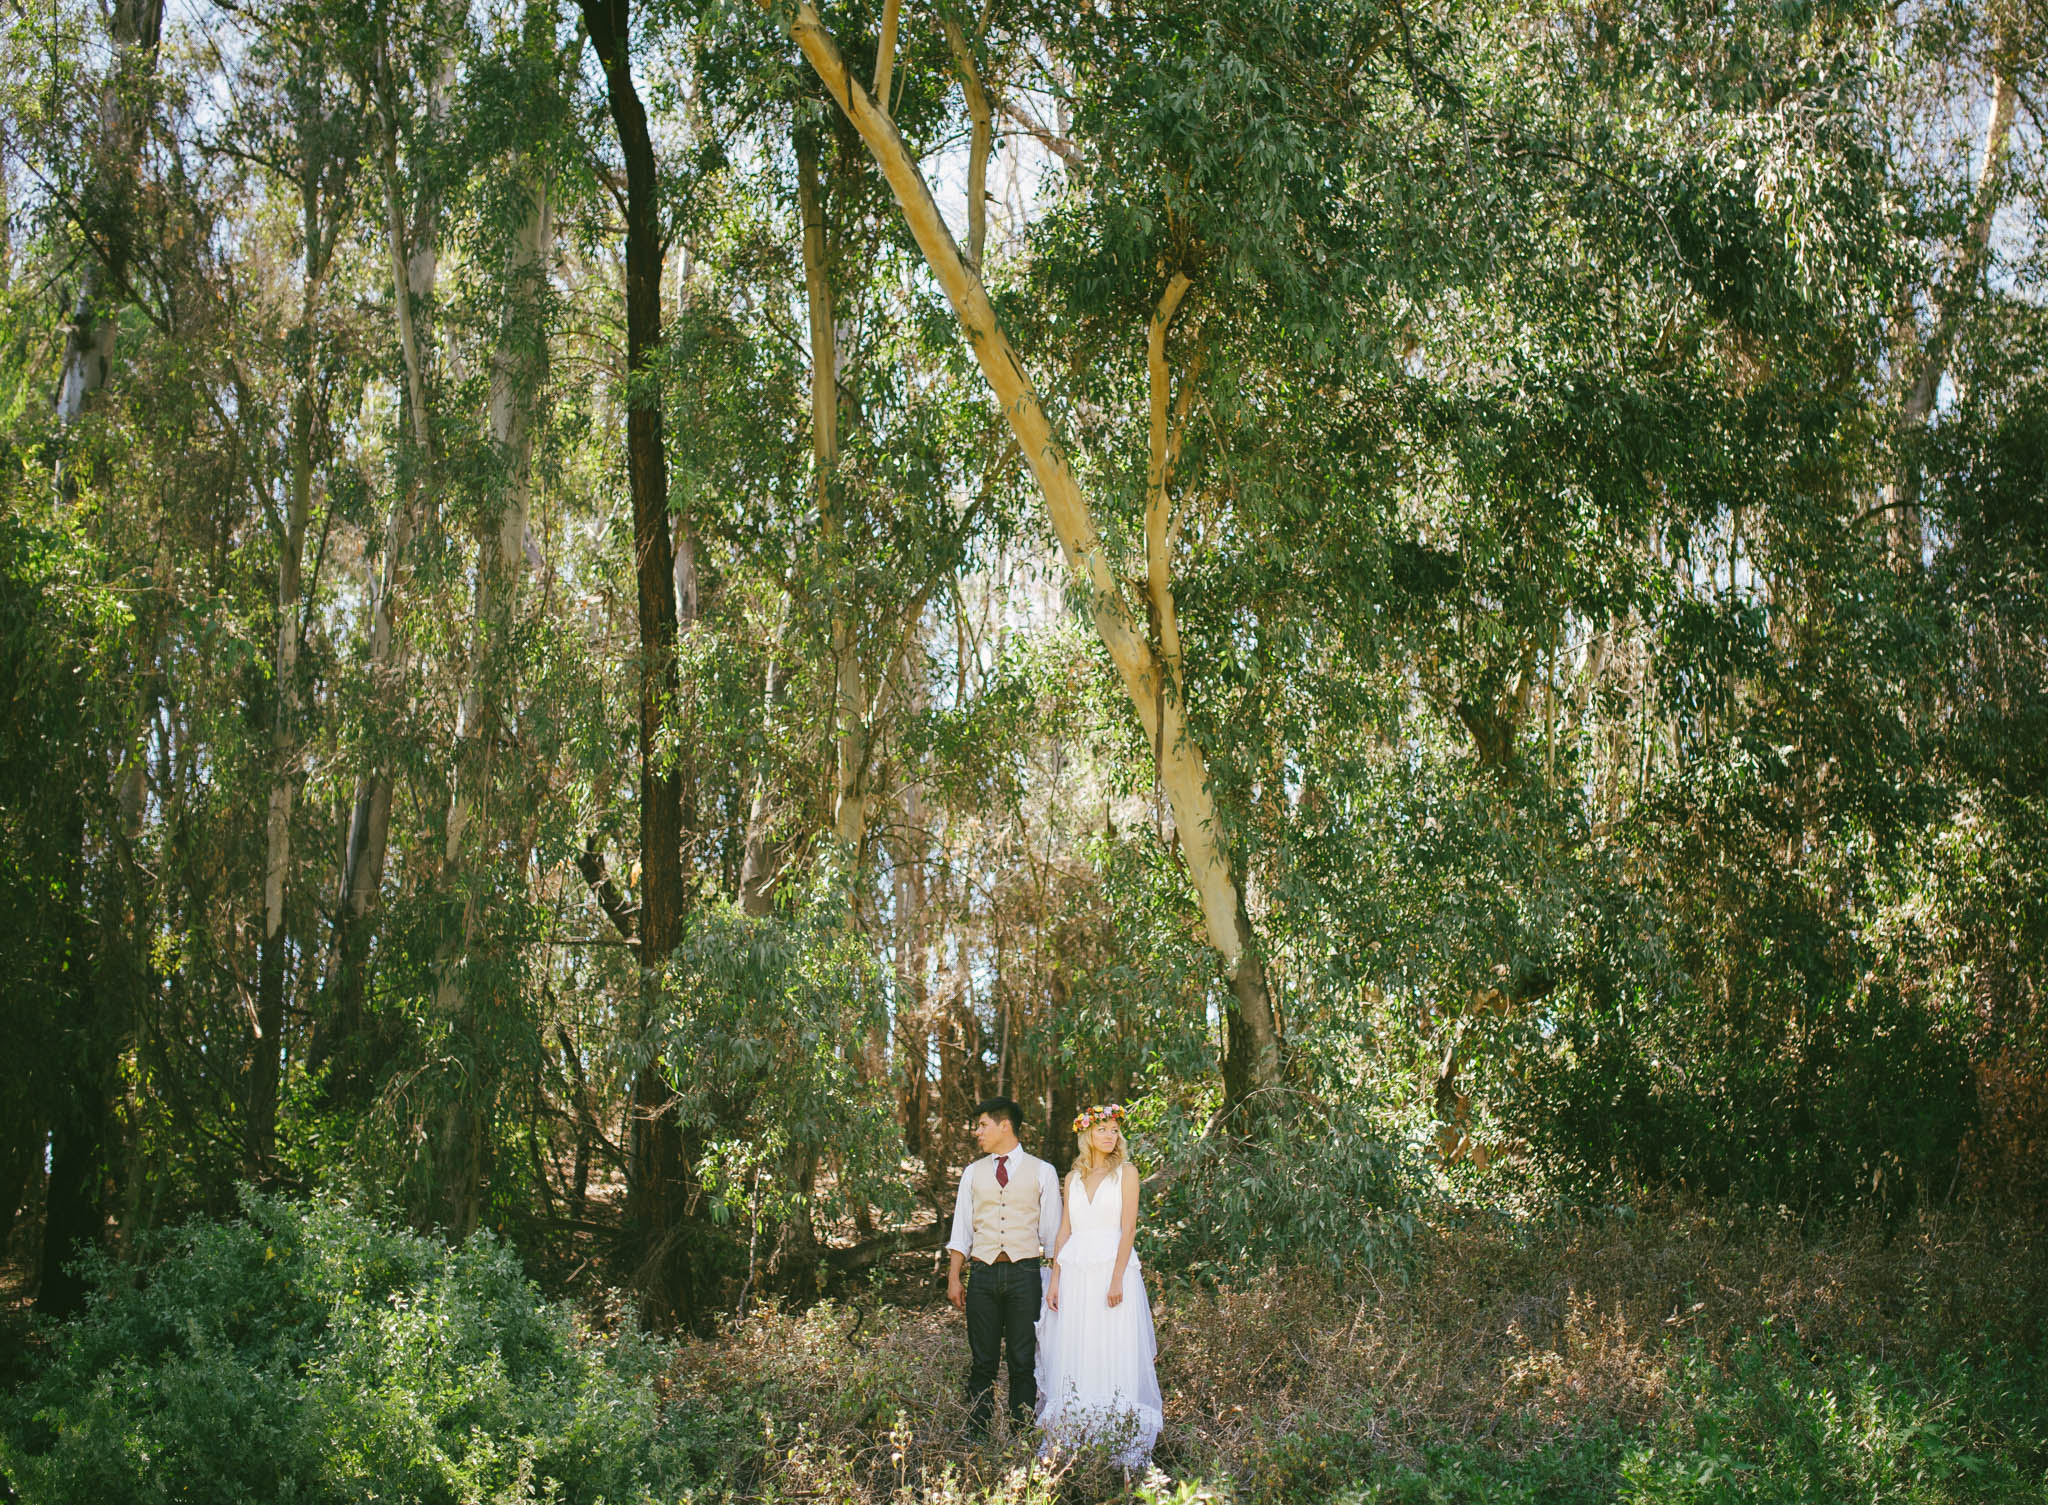 ©Isaiah & Taylor Photography - Los Angeles Wedding Photographer - Mexican Bohemian Wedding, Laguna Niguel Regional Park, Orange County-19.jpg